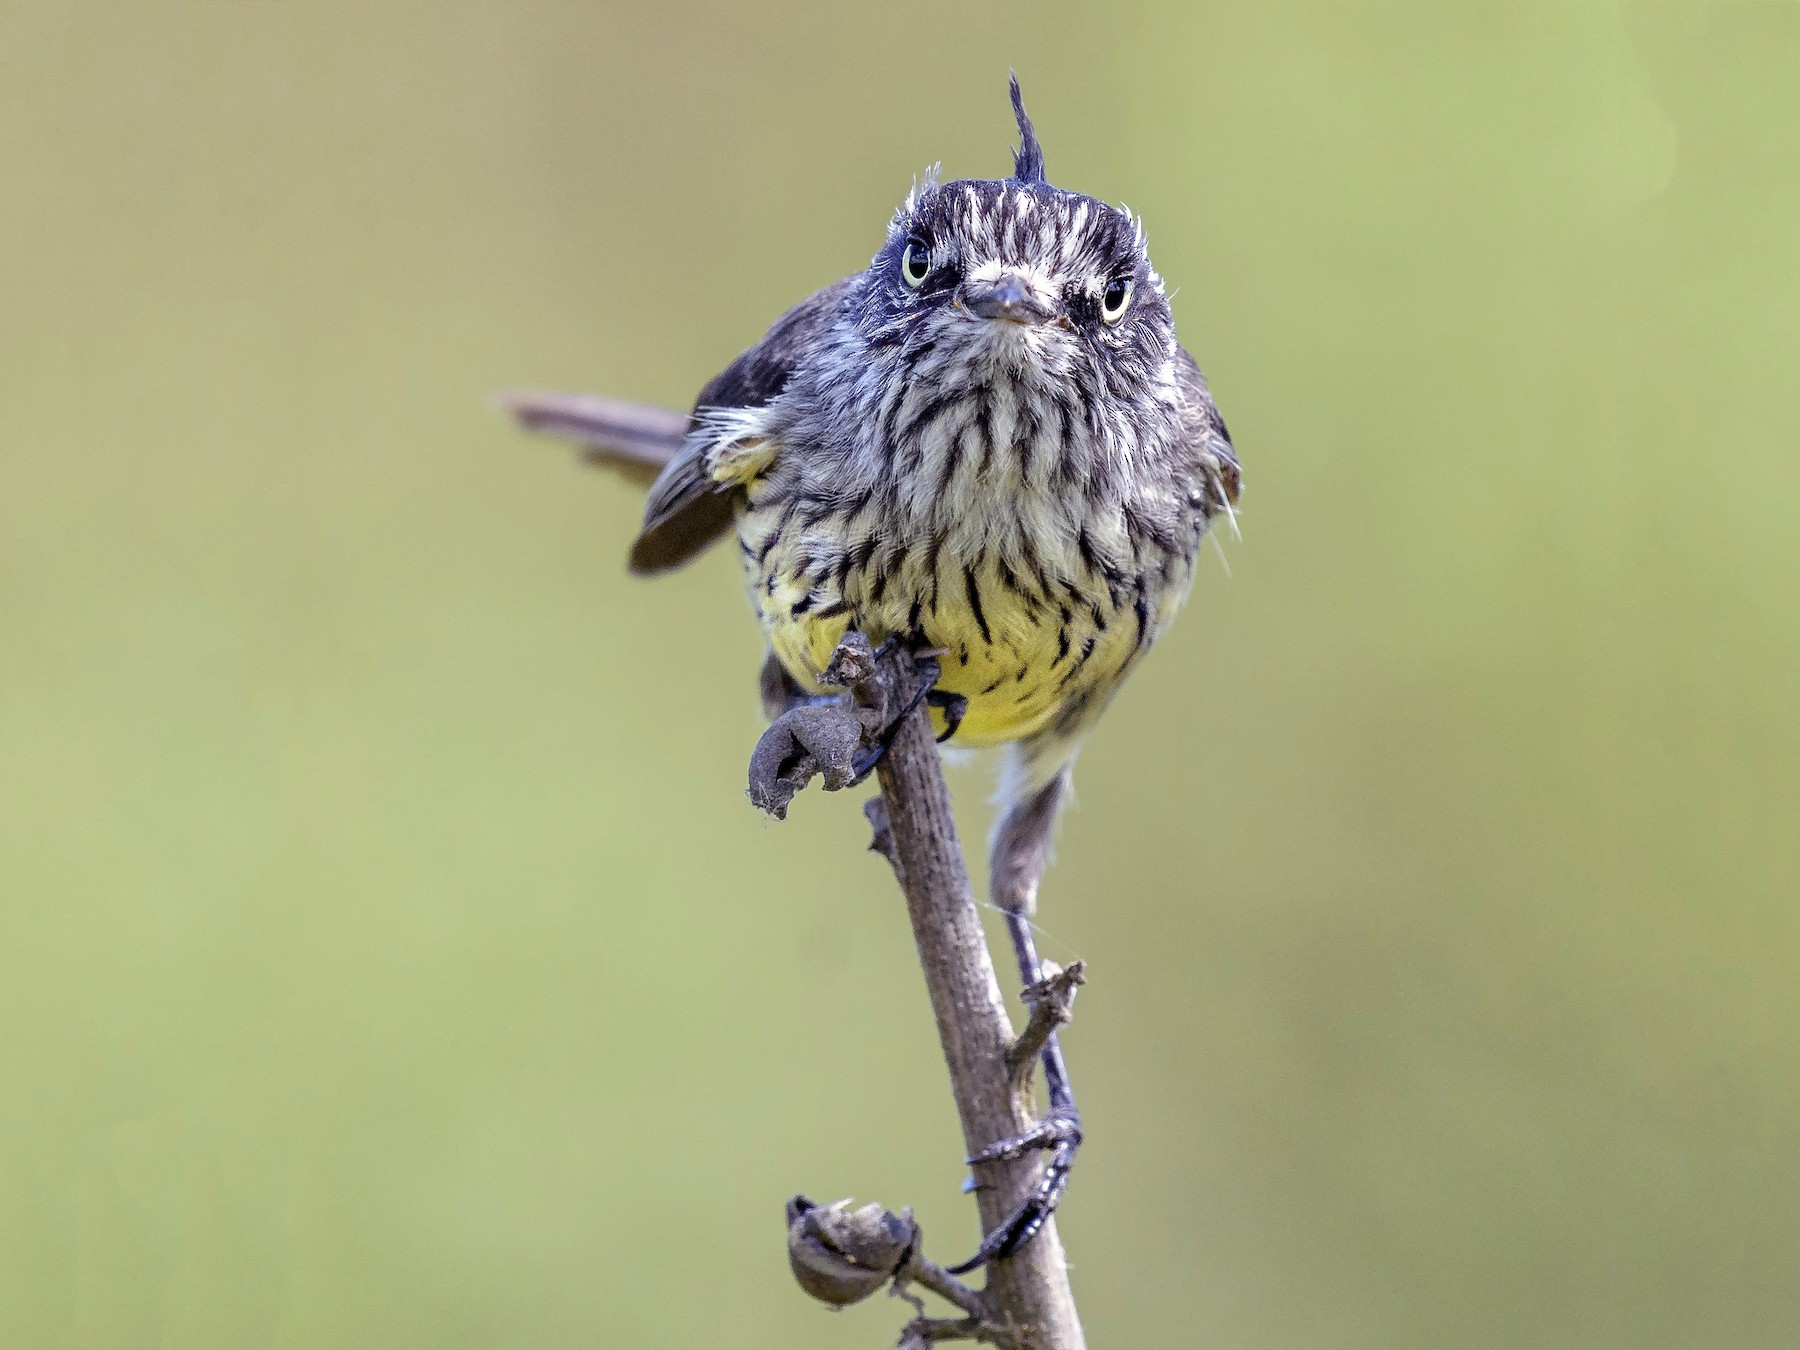 Tufted Tit-Tyrant - VERONICA ARAYA GARCIA